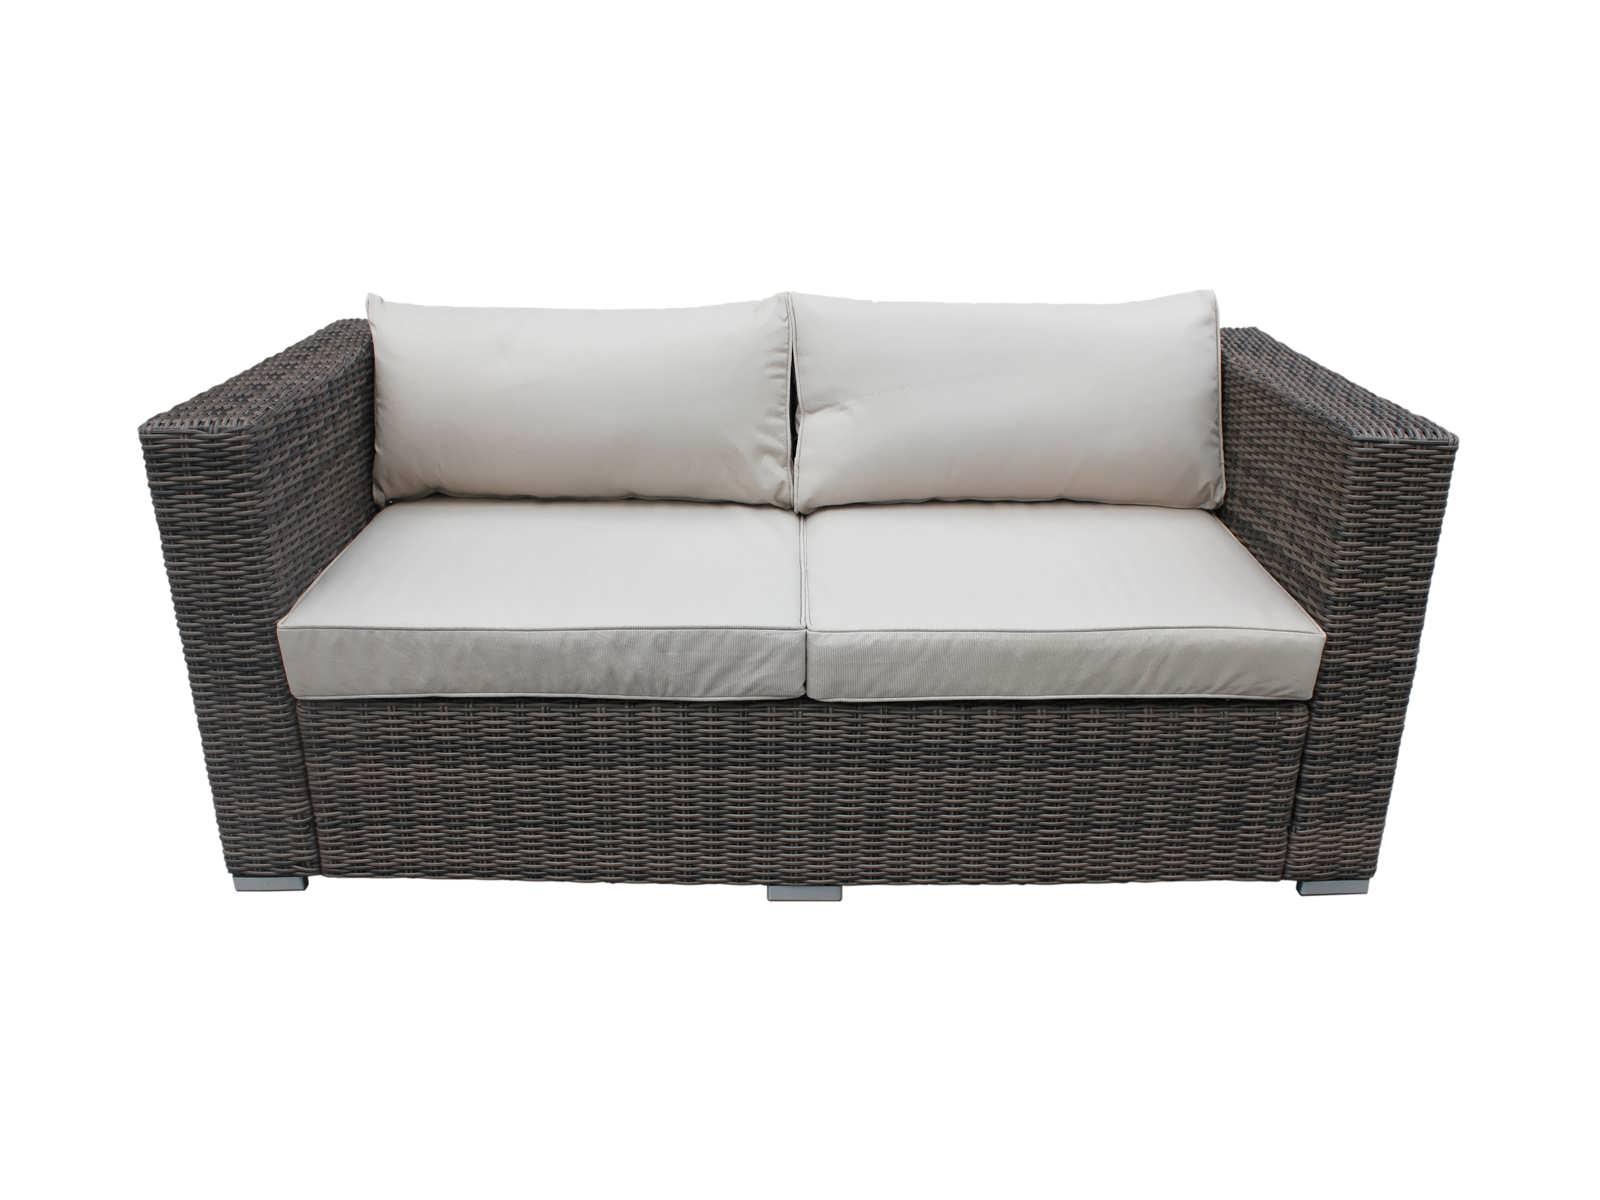 ascot outdoor rattan sofa 2 seat in truffle FLBWJLD